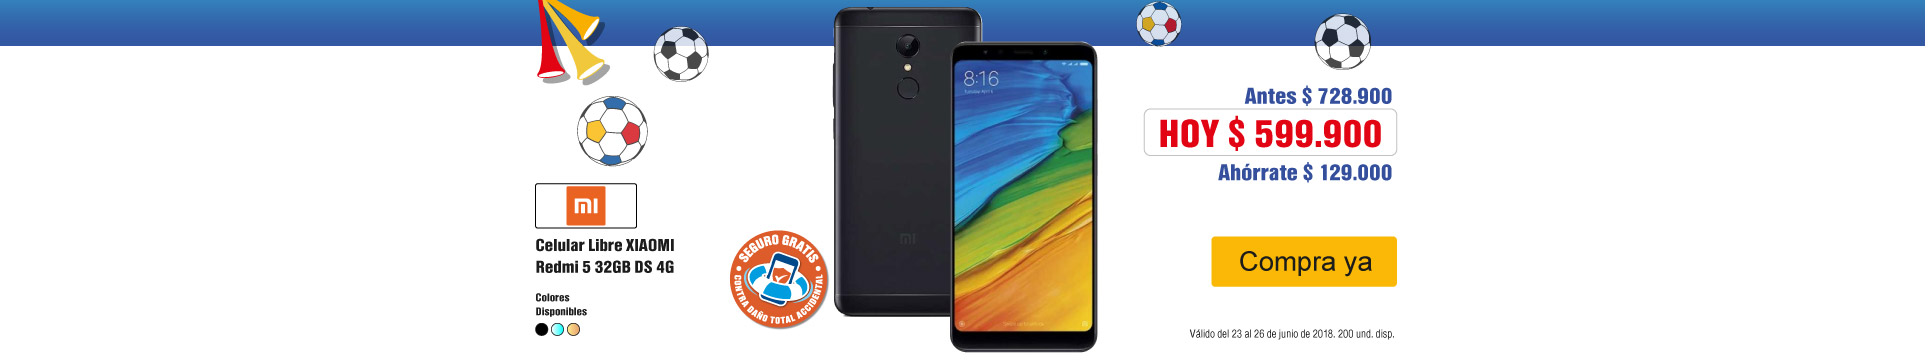 AK-KT-HIPER-6-celulares-PP---Xiaomi-Redmi-5-Jun23